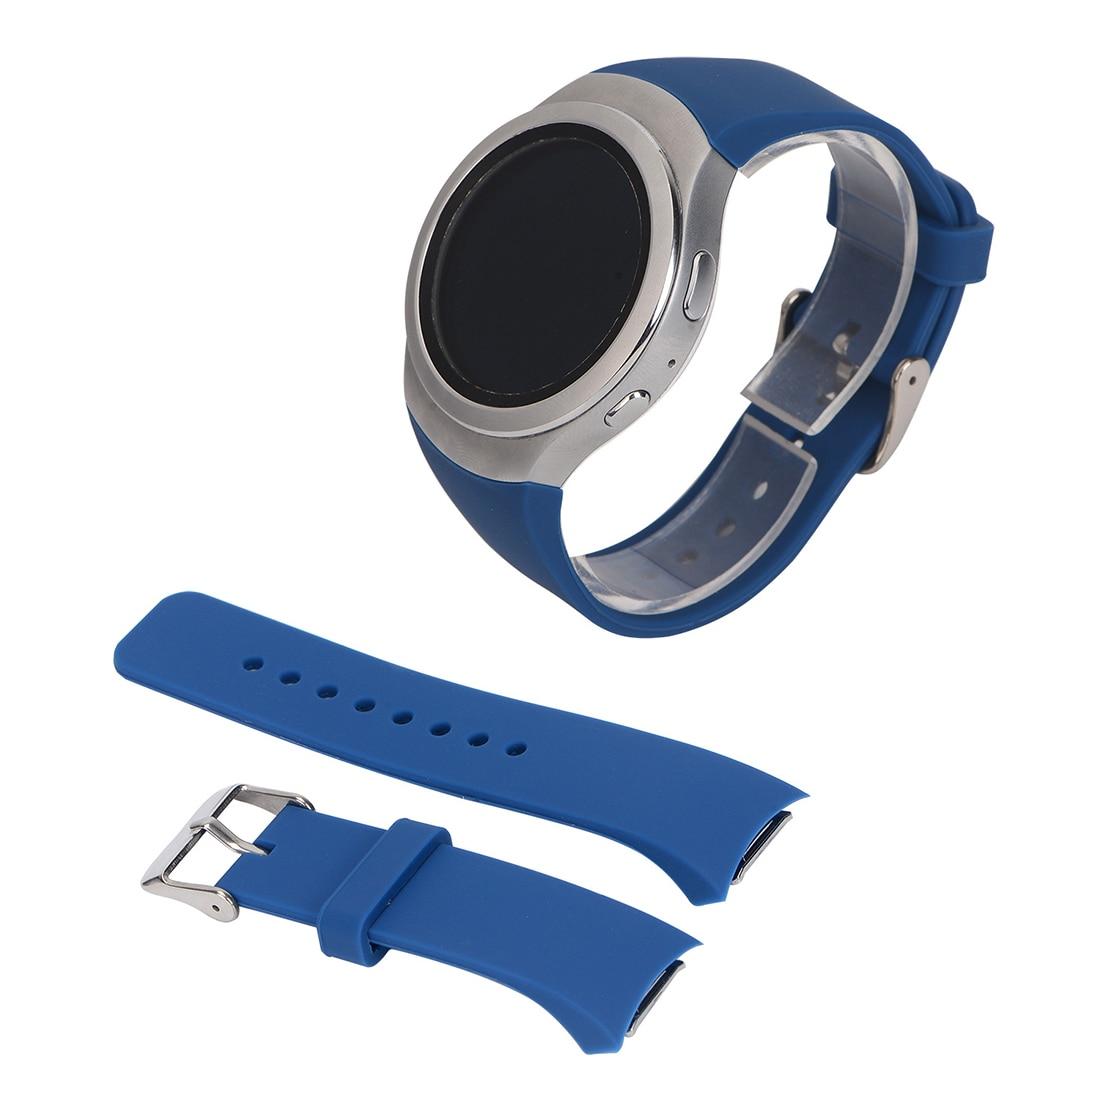 Luxury Silicone Watch Band Strap for Samsung Galaxy S2 Gear SM-R720 Navy blue eache silicone watch band strap replacement watch band can fit for swatch 17mm 19mm men women